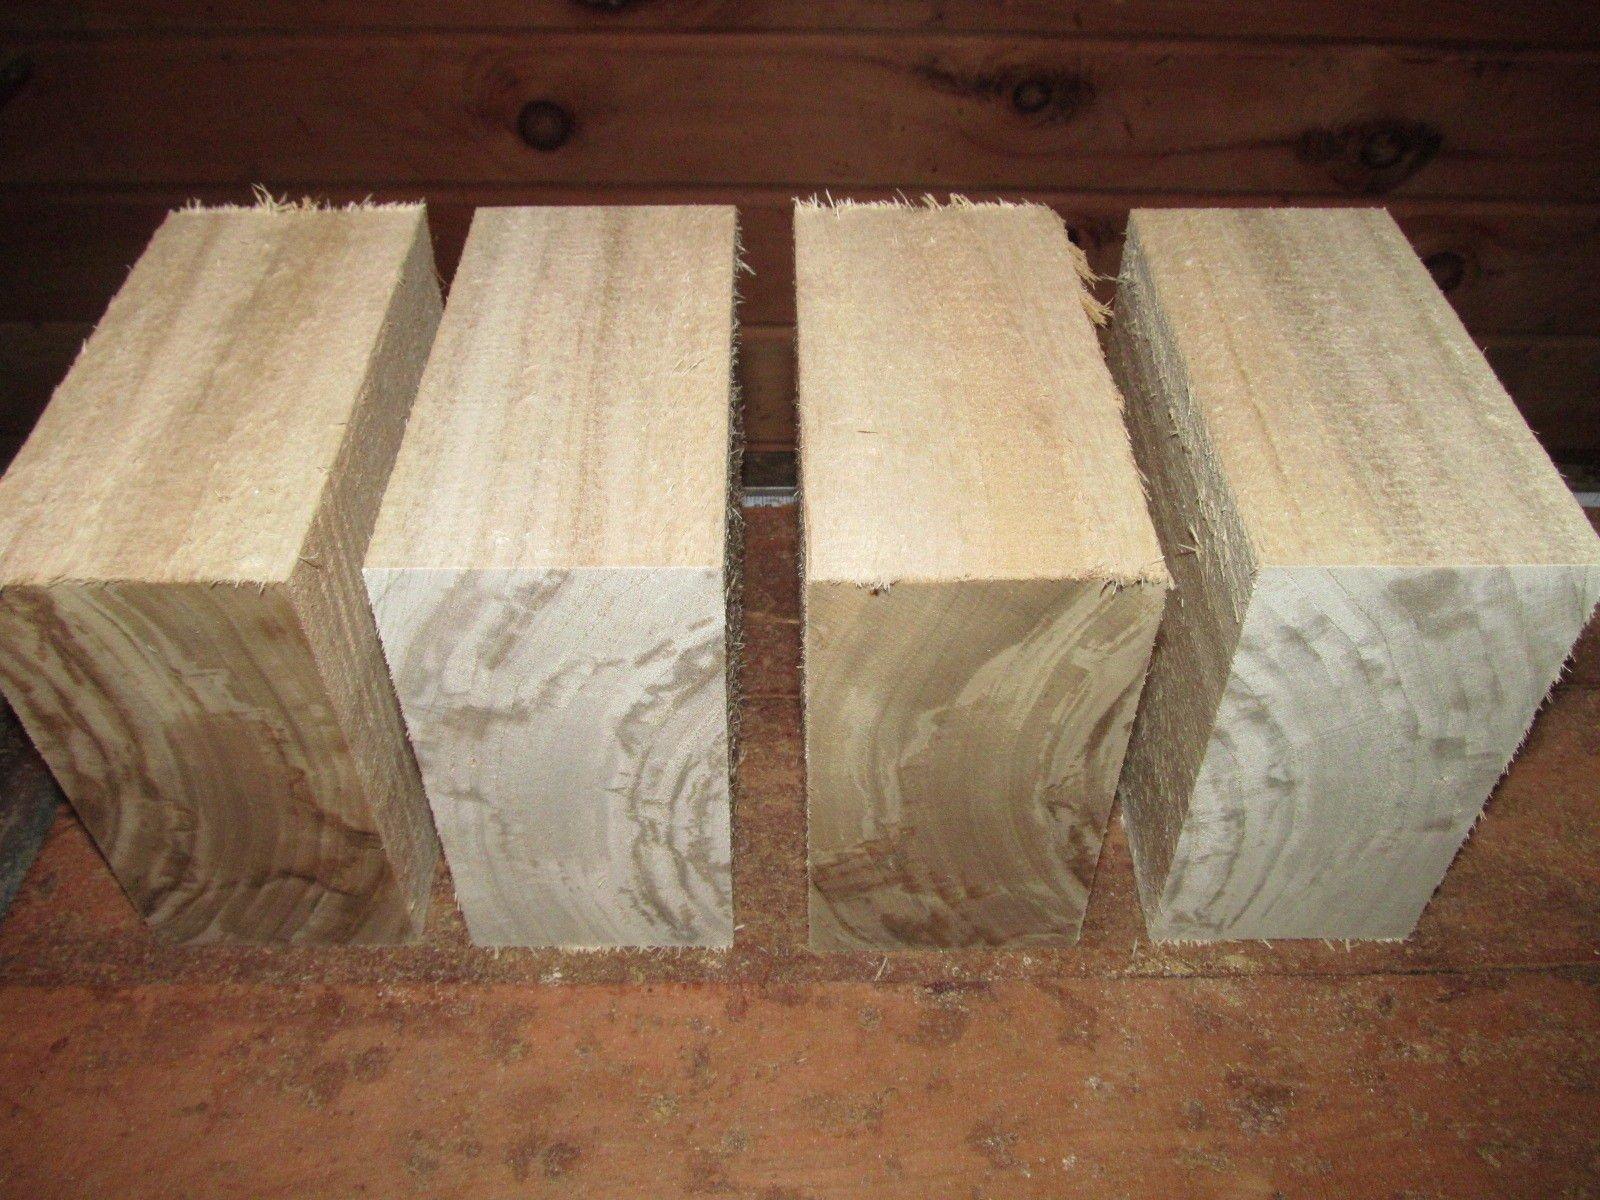 4 Cottonwood Bowl Blanks Turning Blocks Lumber Wood Lathe Carve Turn 5 X 5 X 3''